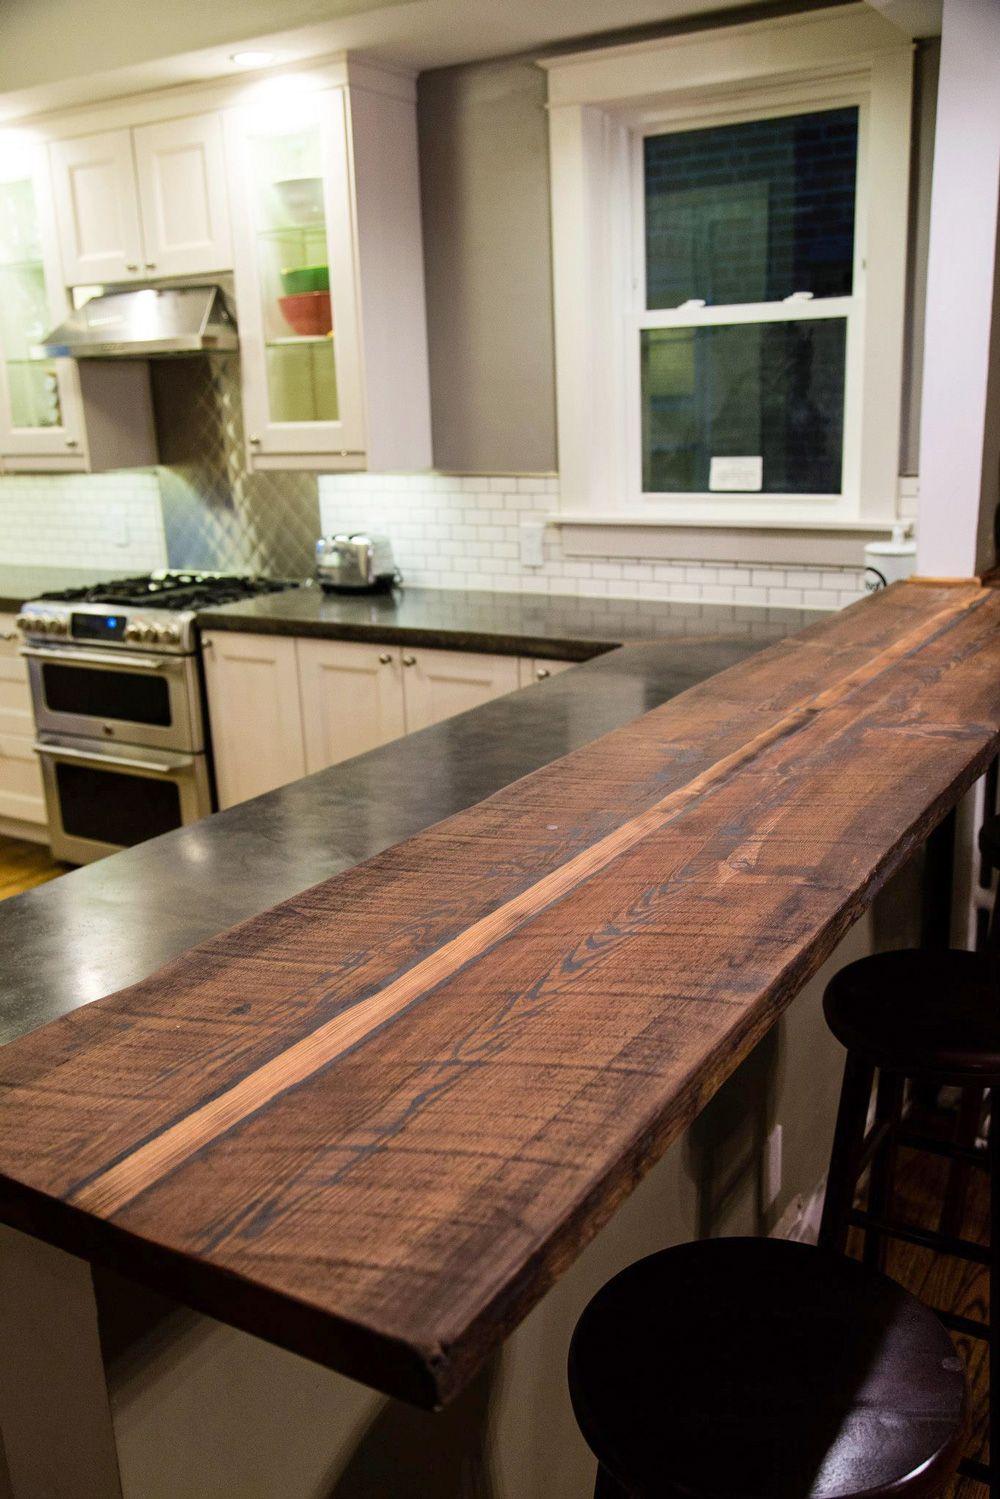 Kitchen Renovation Part 3 The Reveal Hammer Moxie